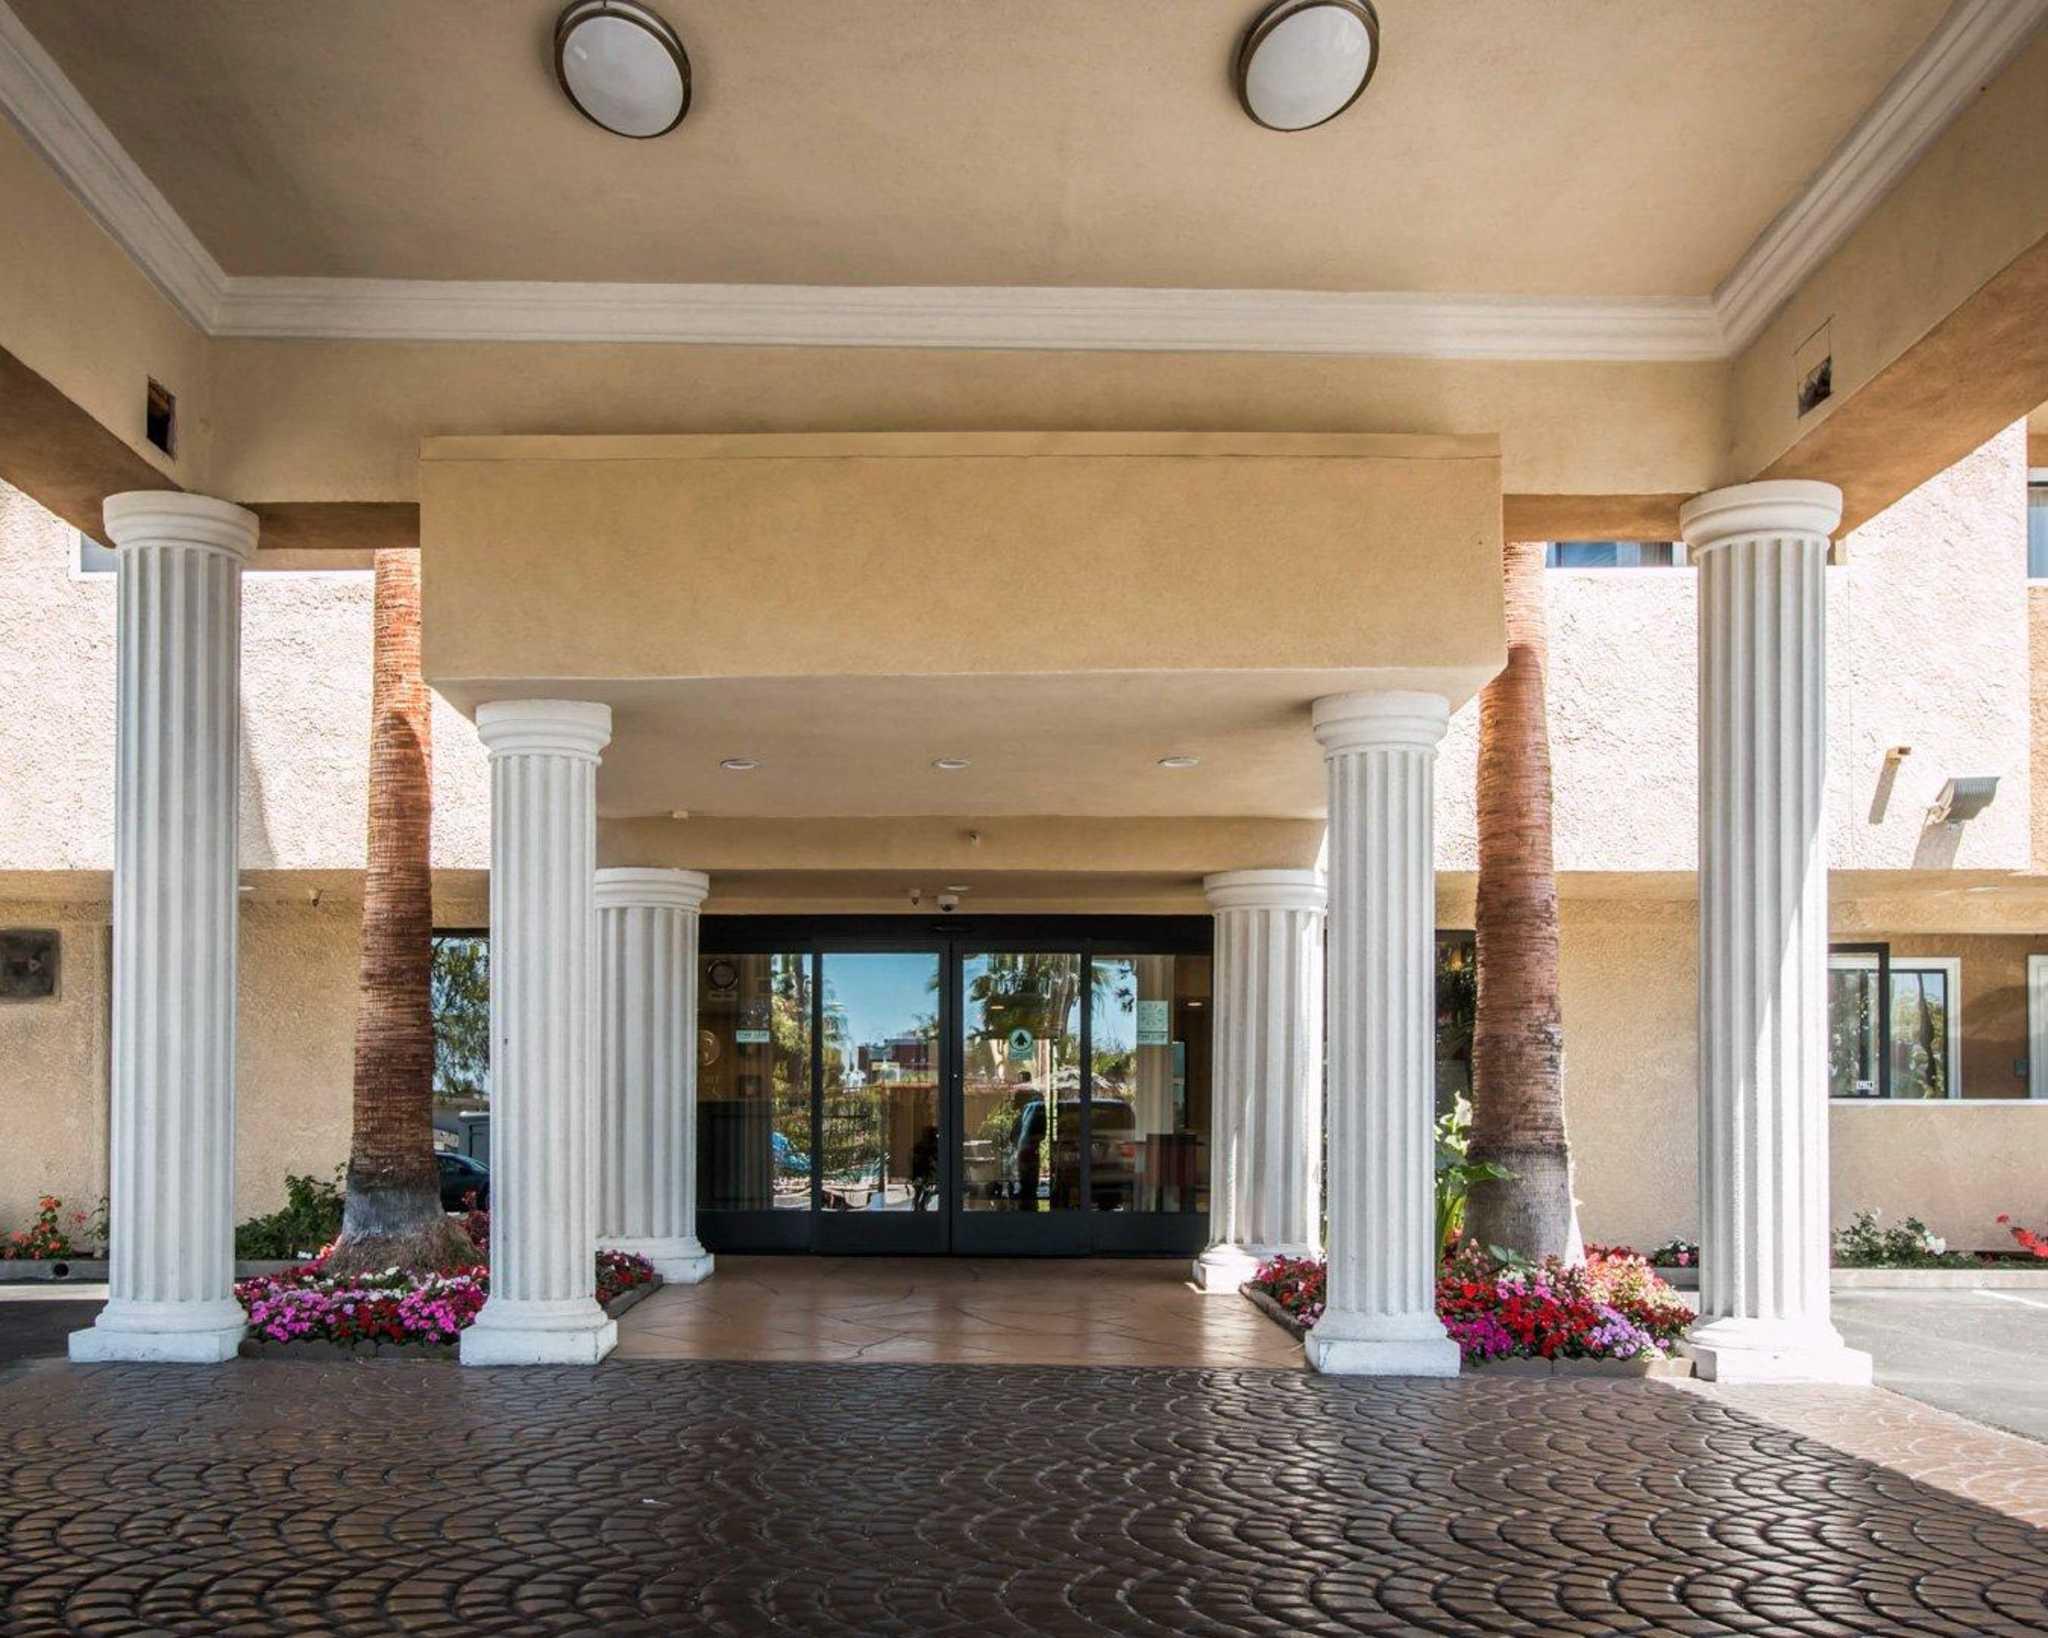 Comfort Suites Huntington Beach image 2